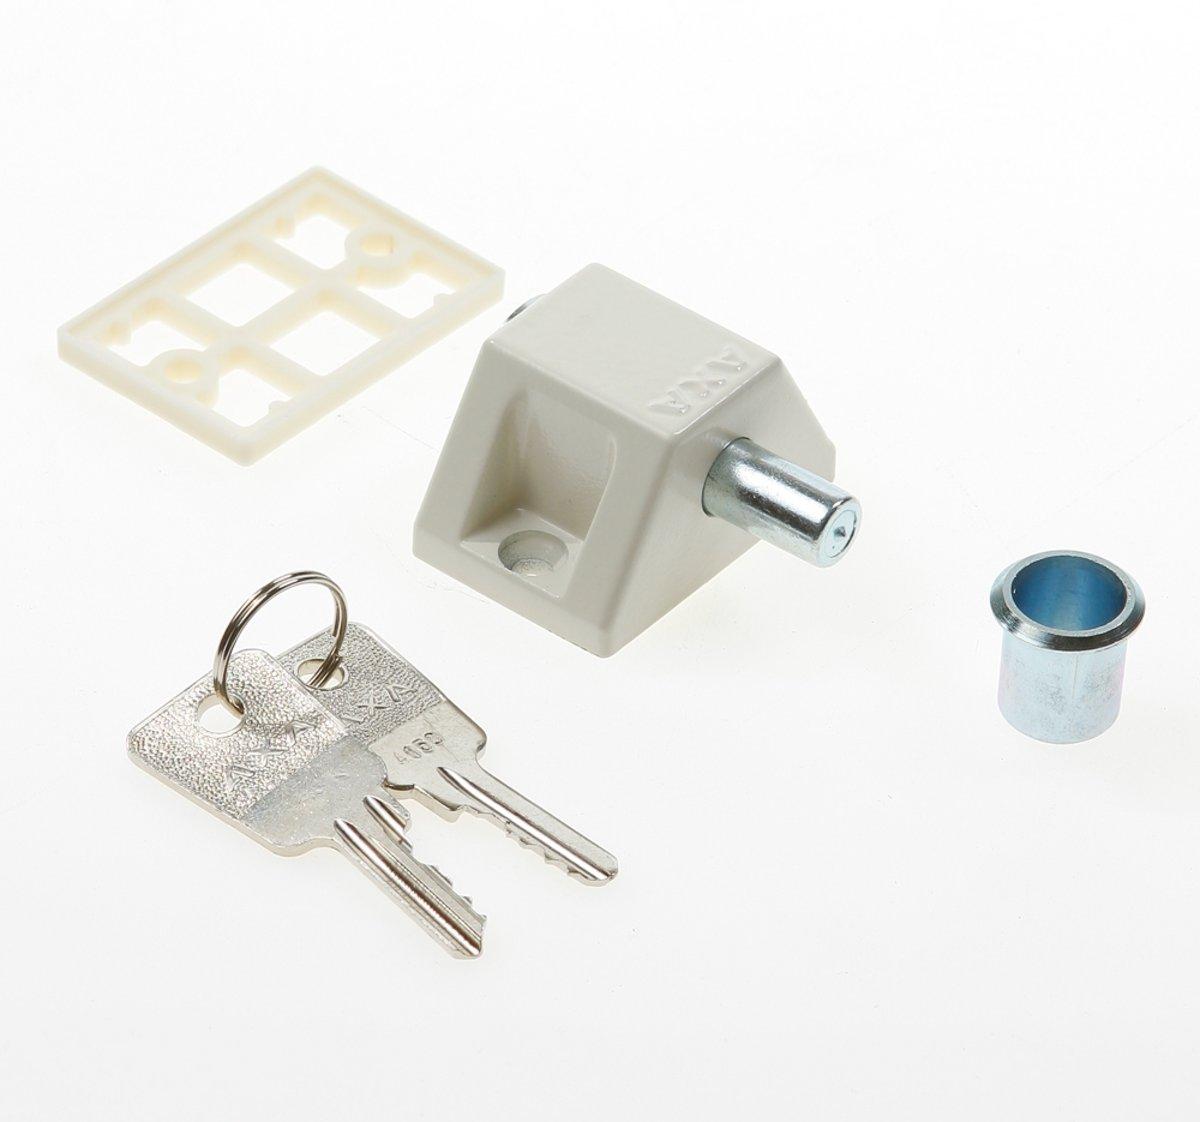 AXA 3011 - Oplegslot - 3011-00-68/0LE - wit